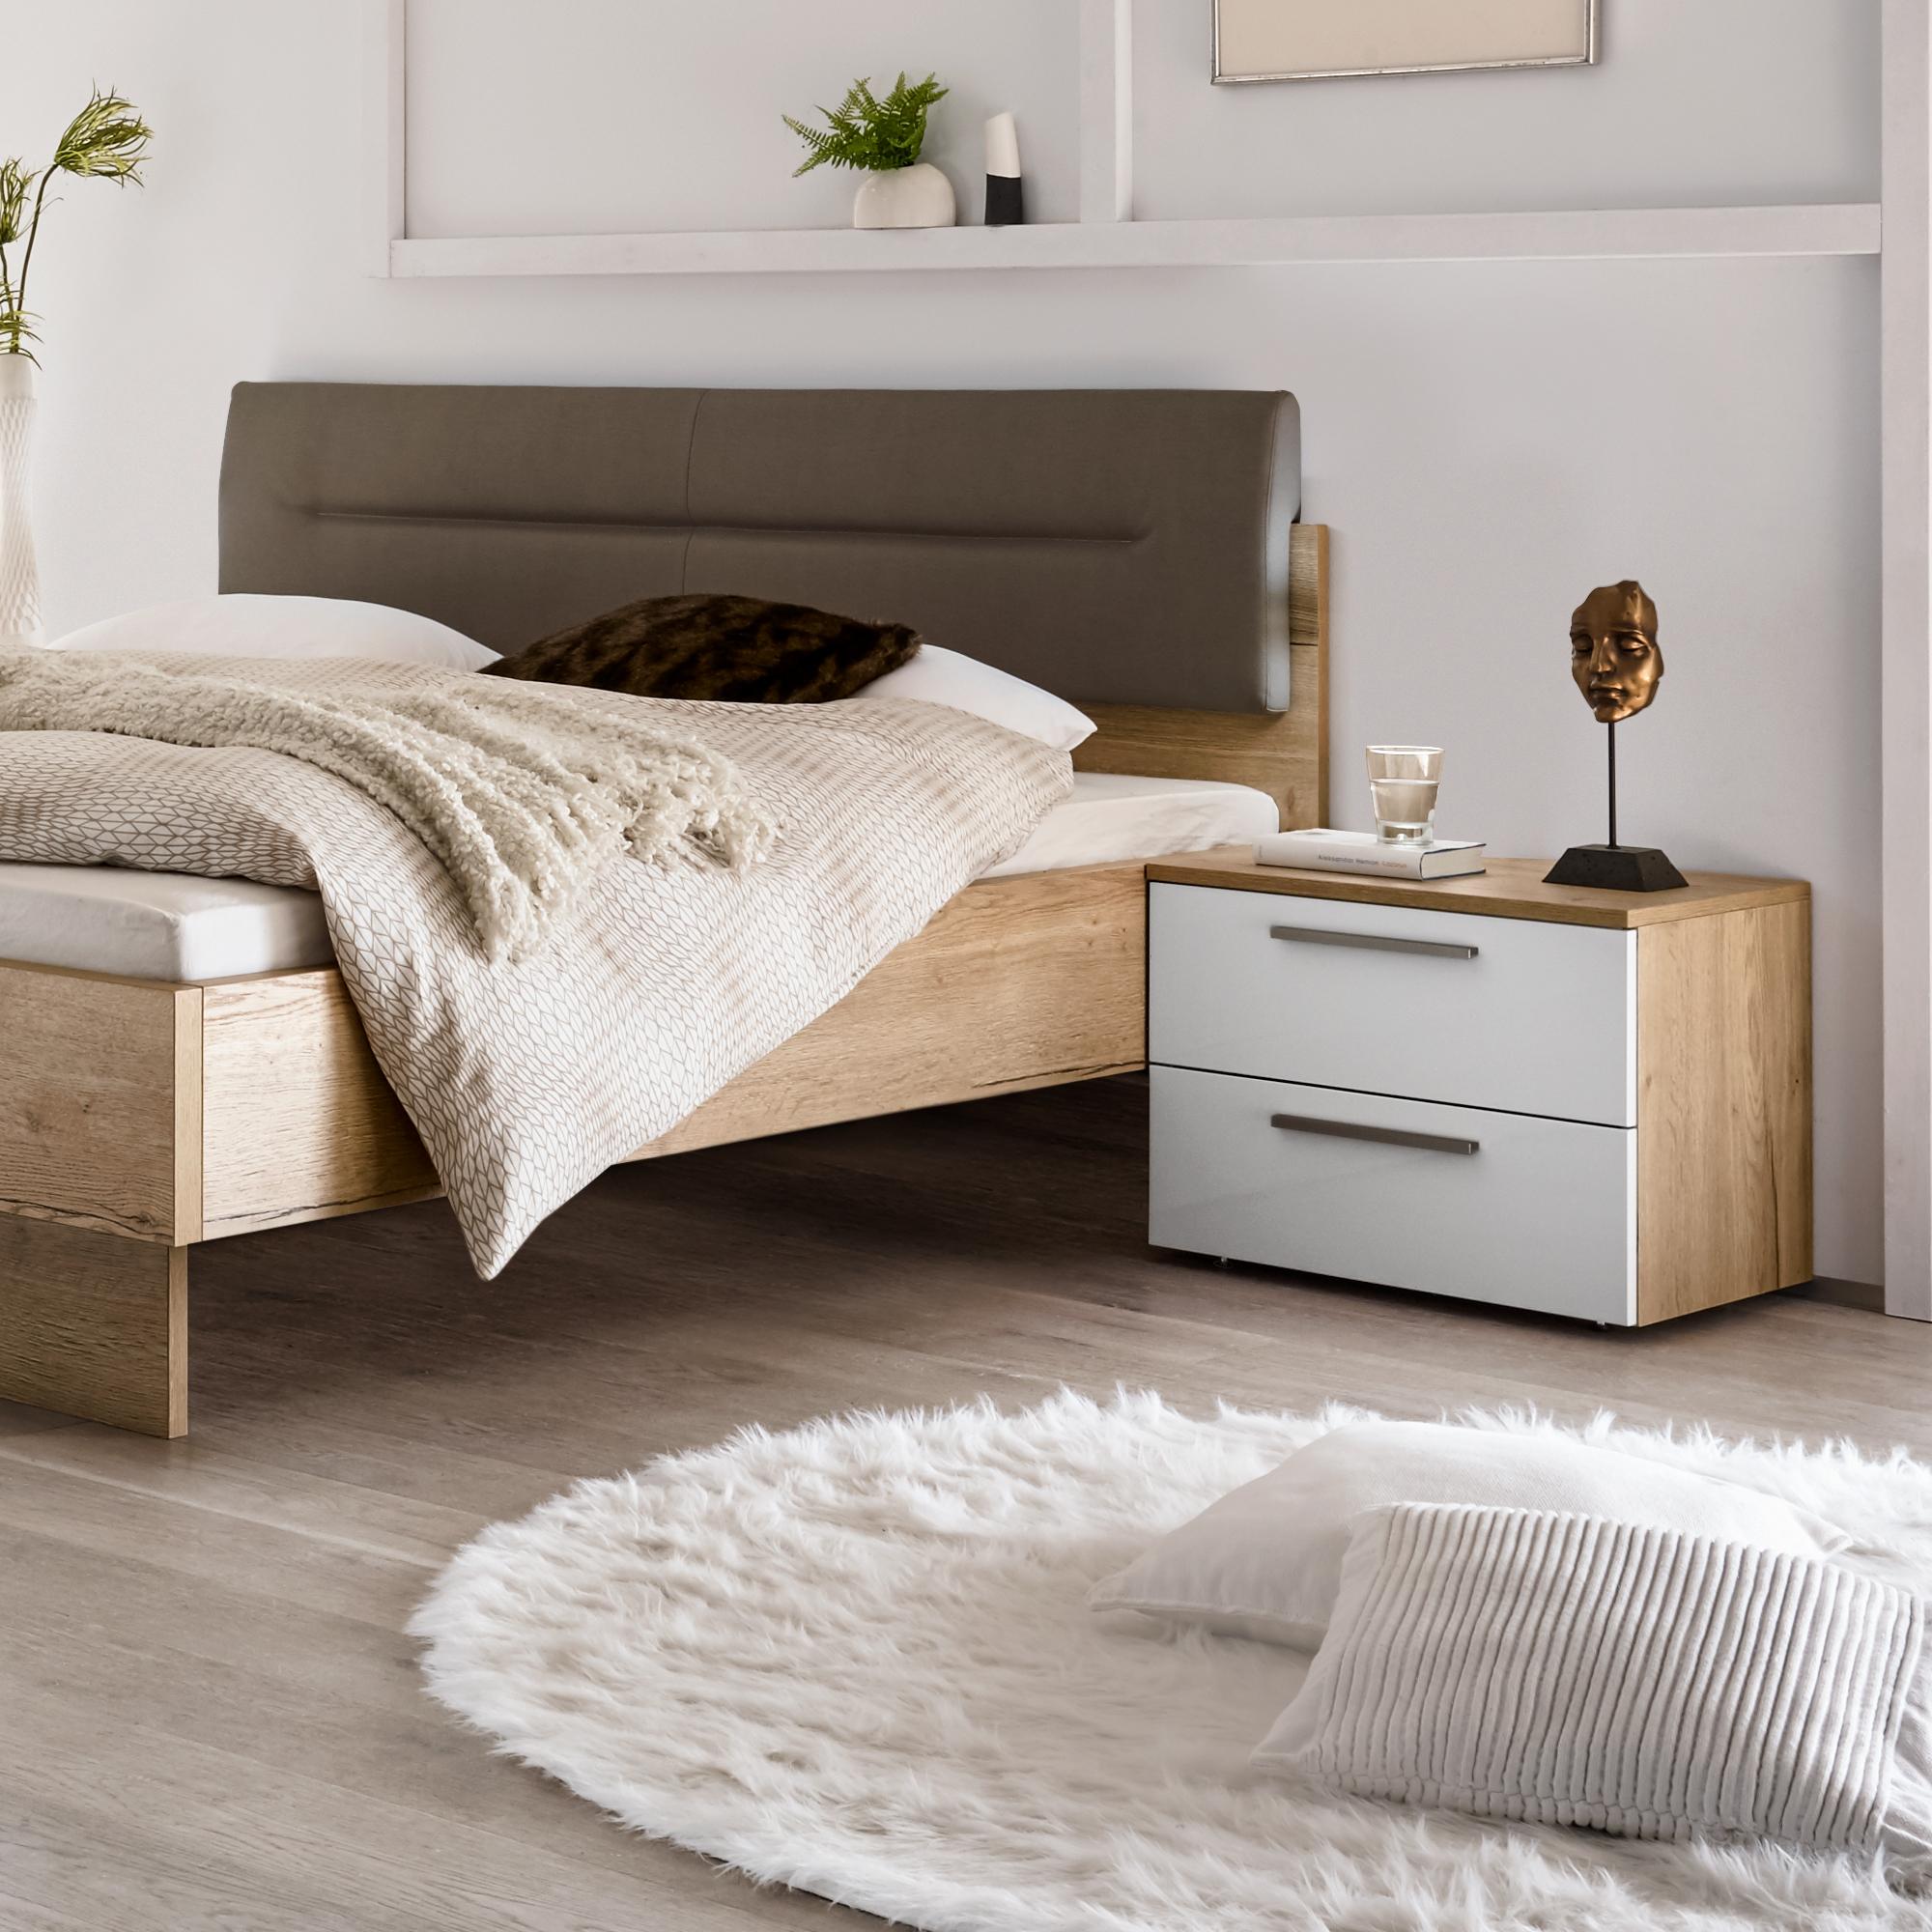 Schlafzimmer Madina Mobel Preiss